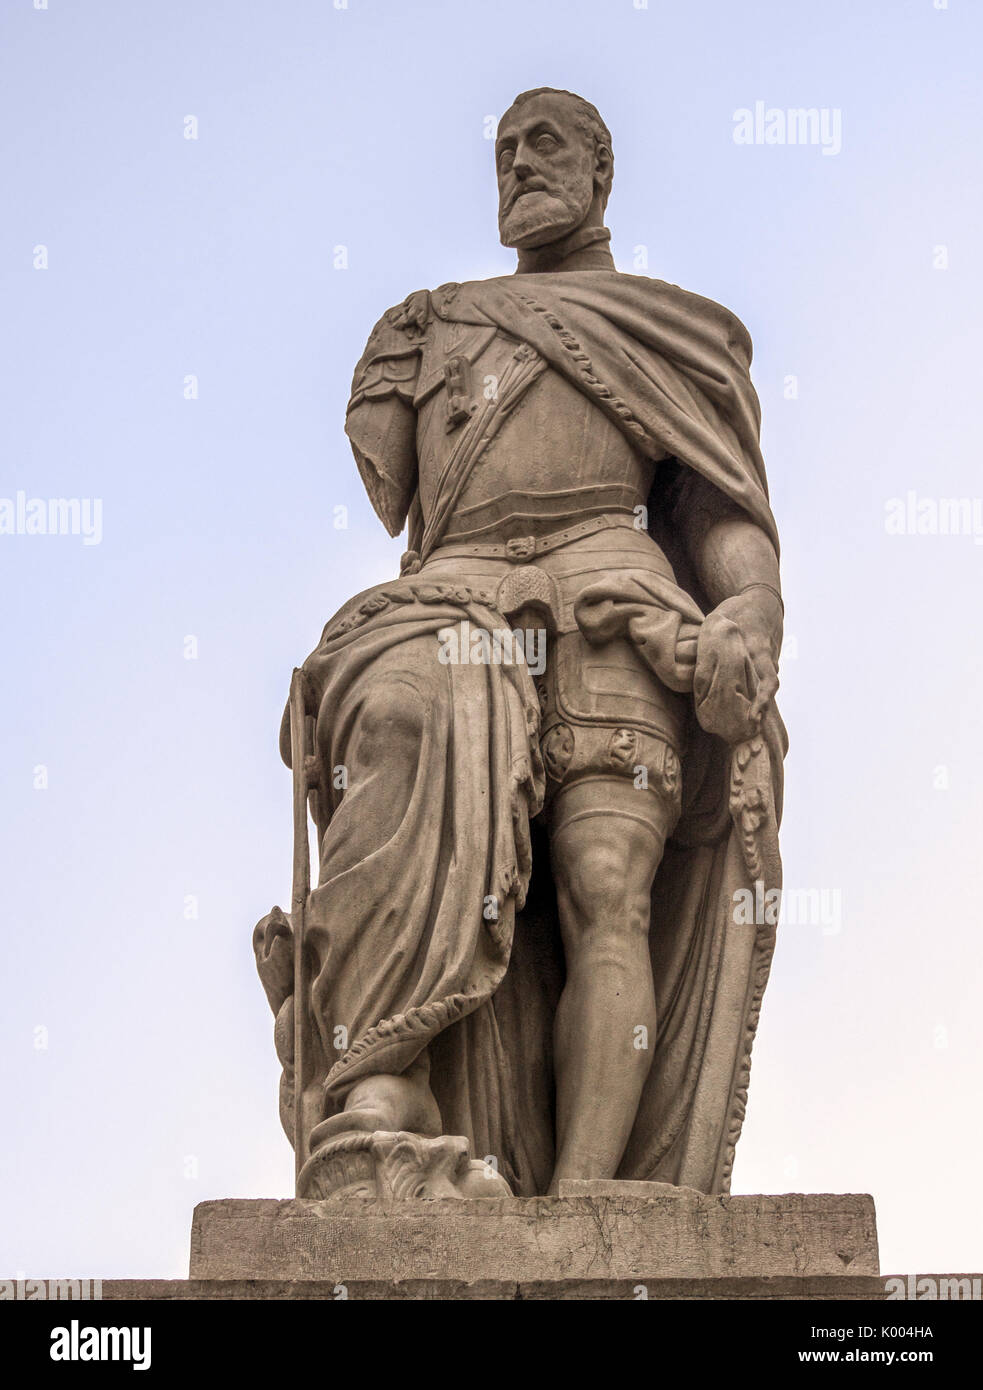 GRANADA,SPAIN:  Statue of  Charles I of Spain in Plaza Universidad - Stock Image